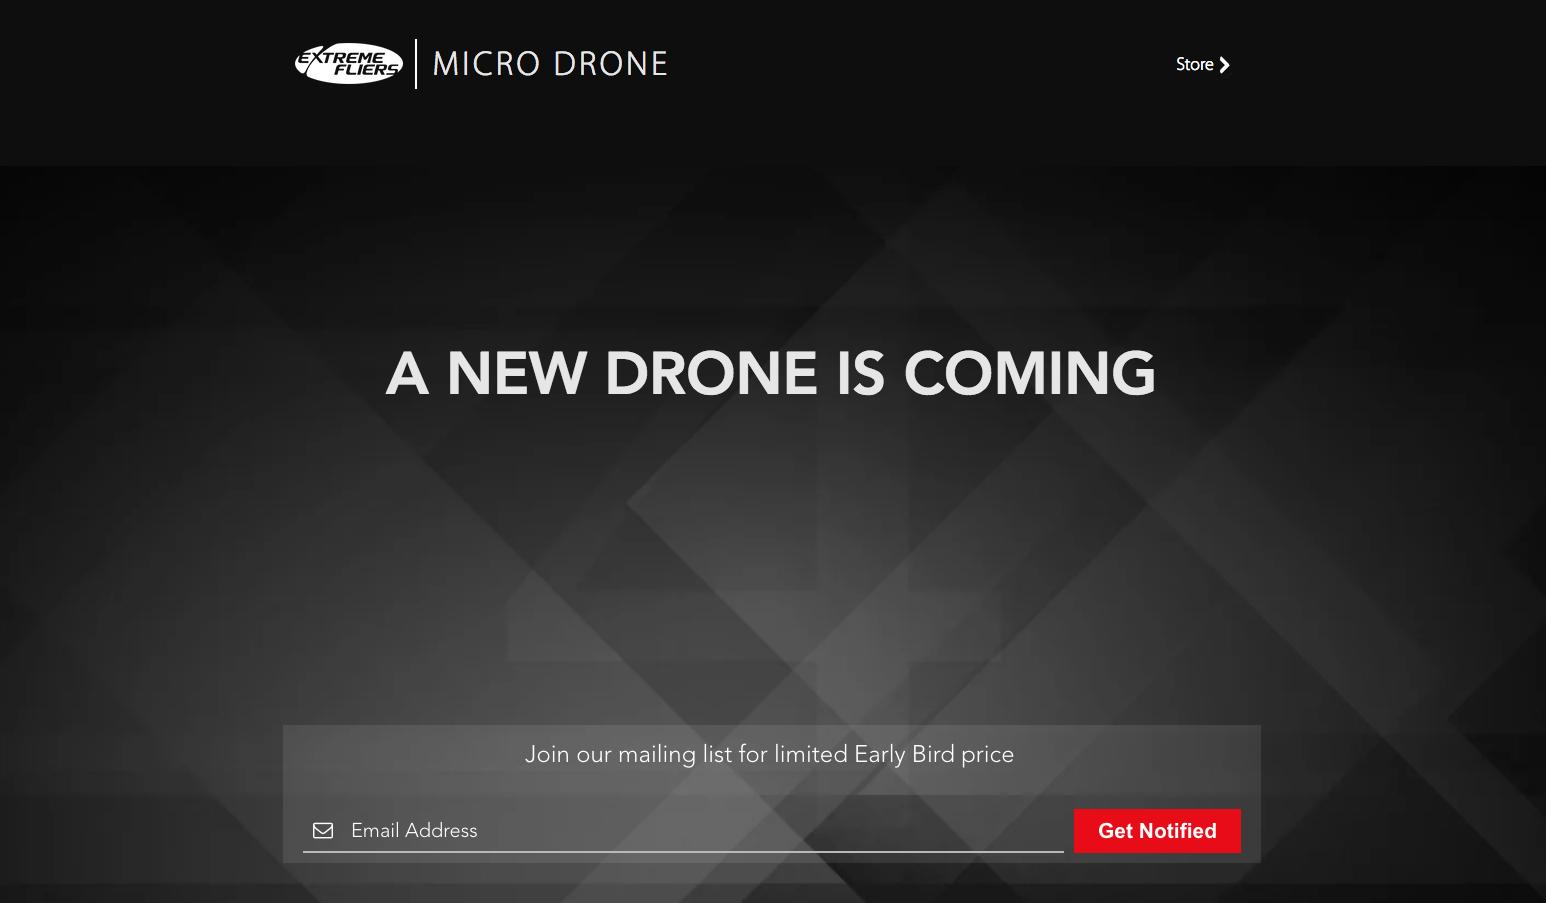 Micro Drone - Coming Soon